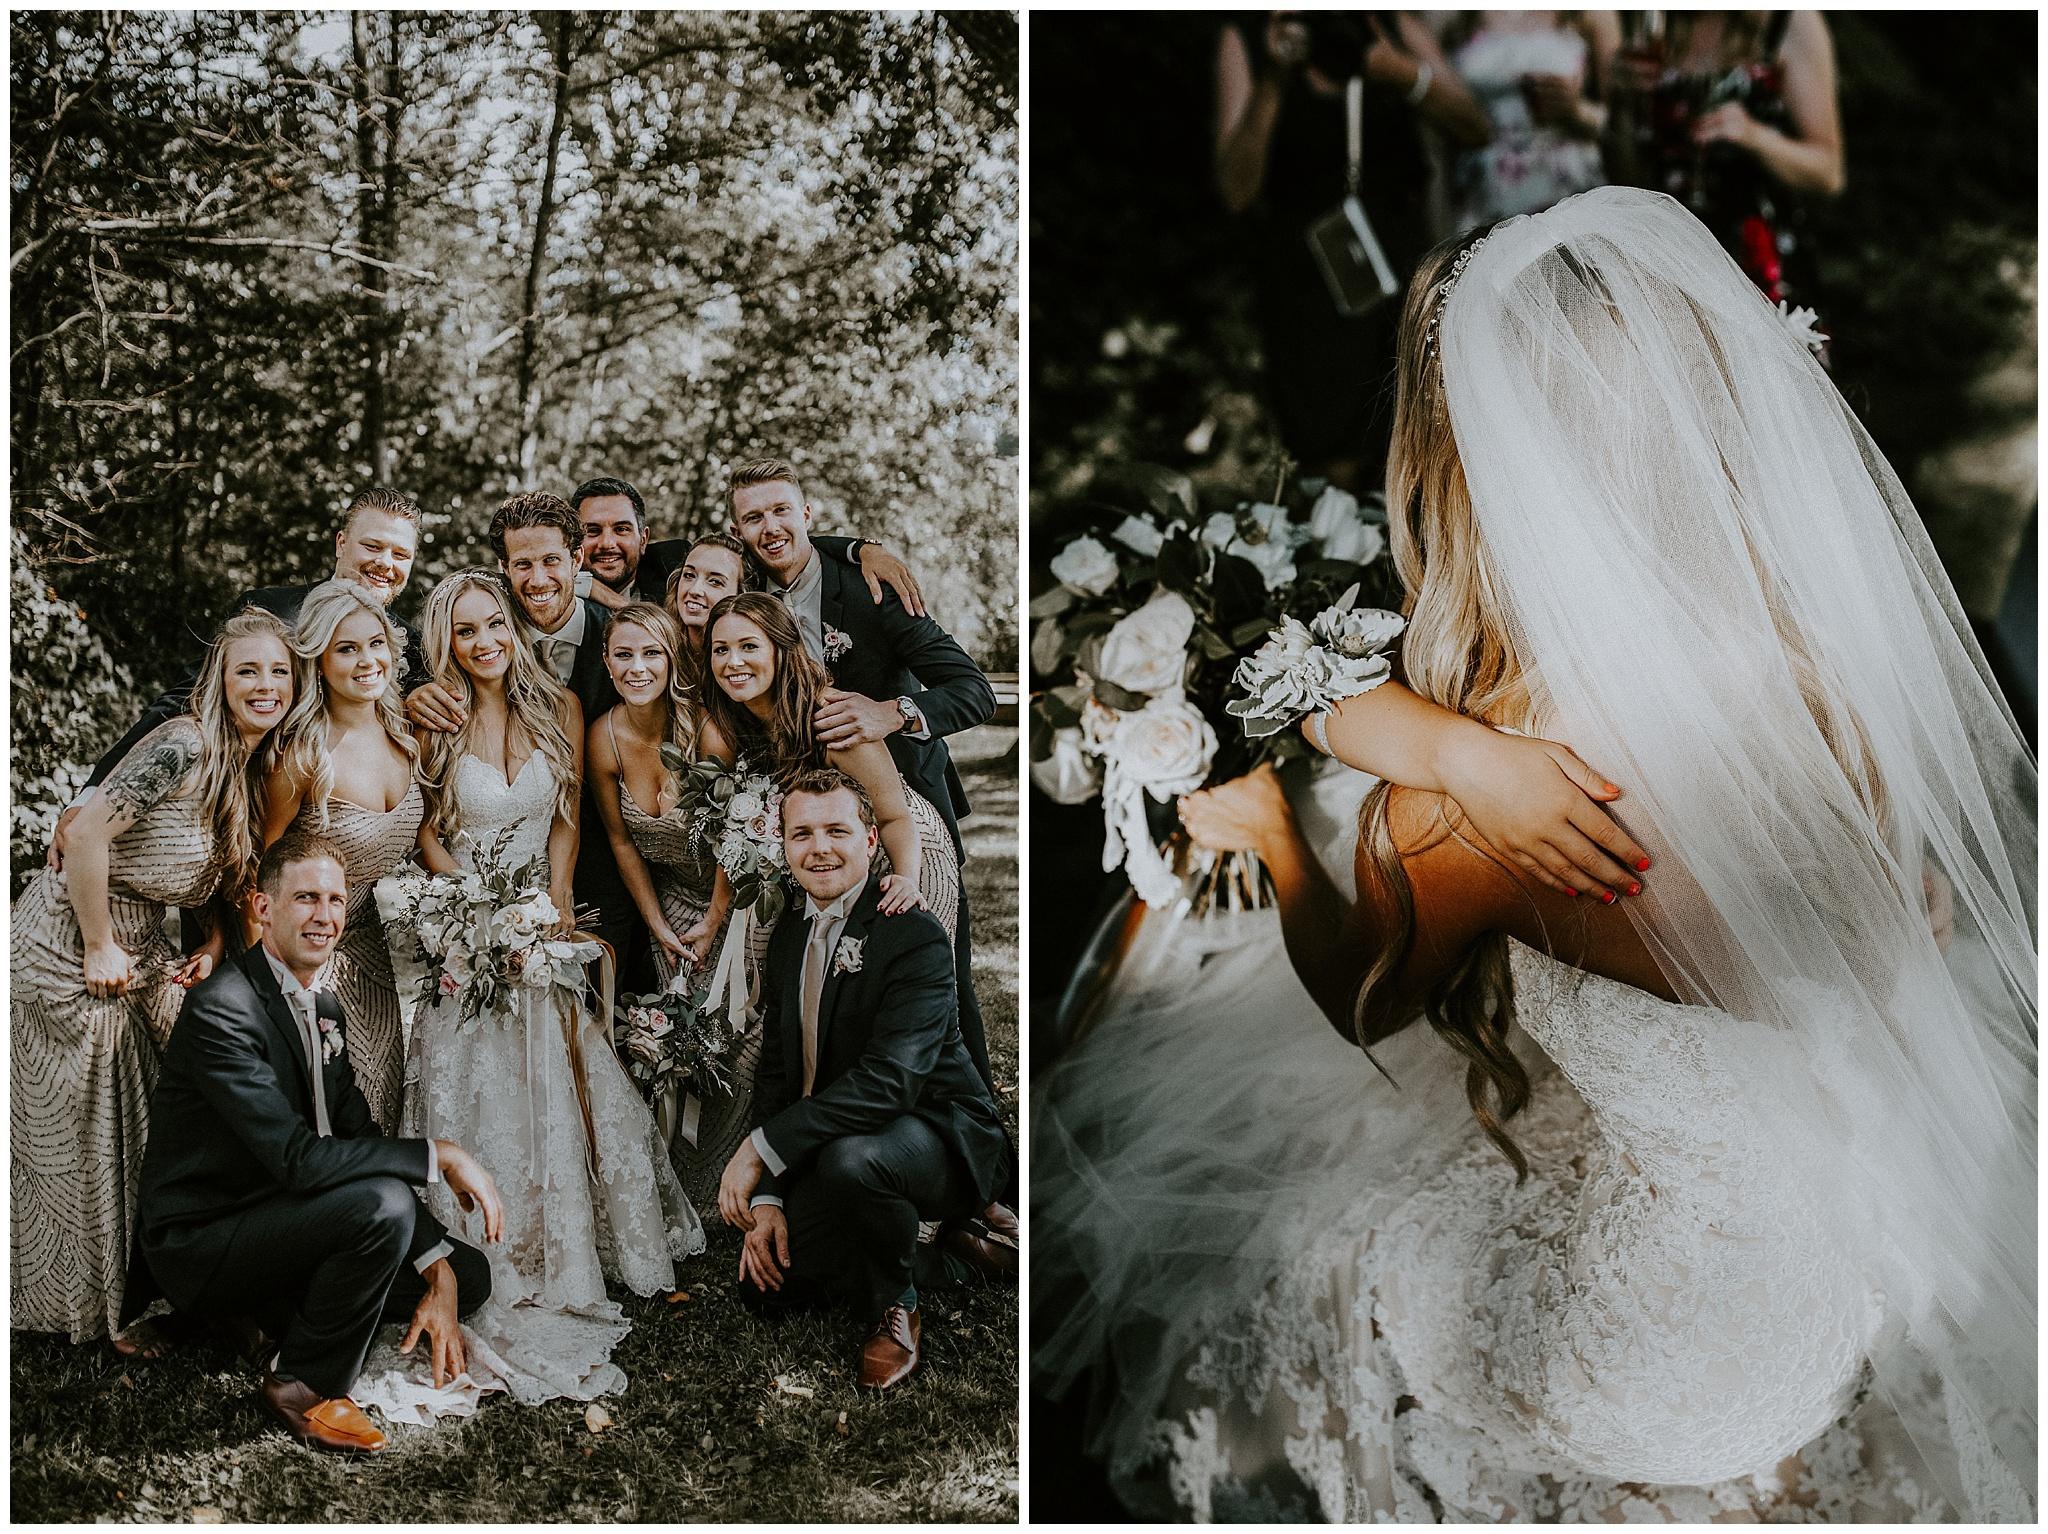 hart-house-vancouver-wedding-brittandkyle-019.JPG